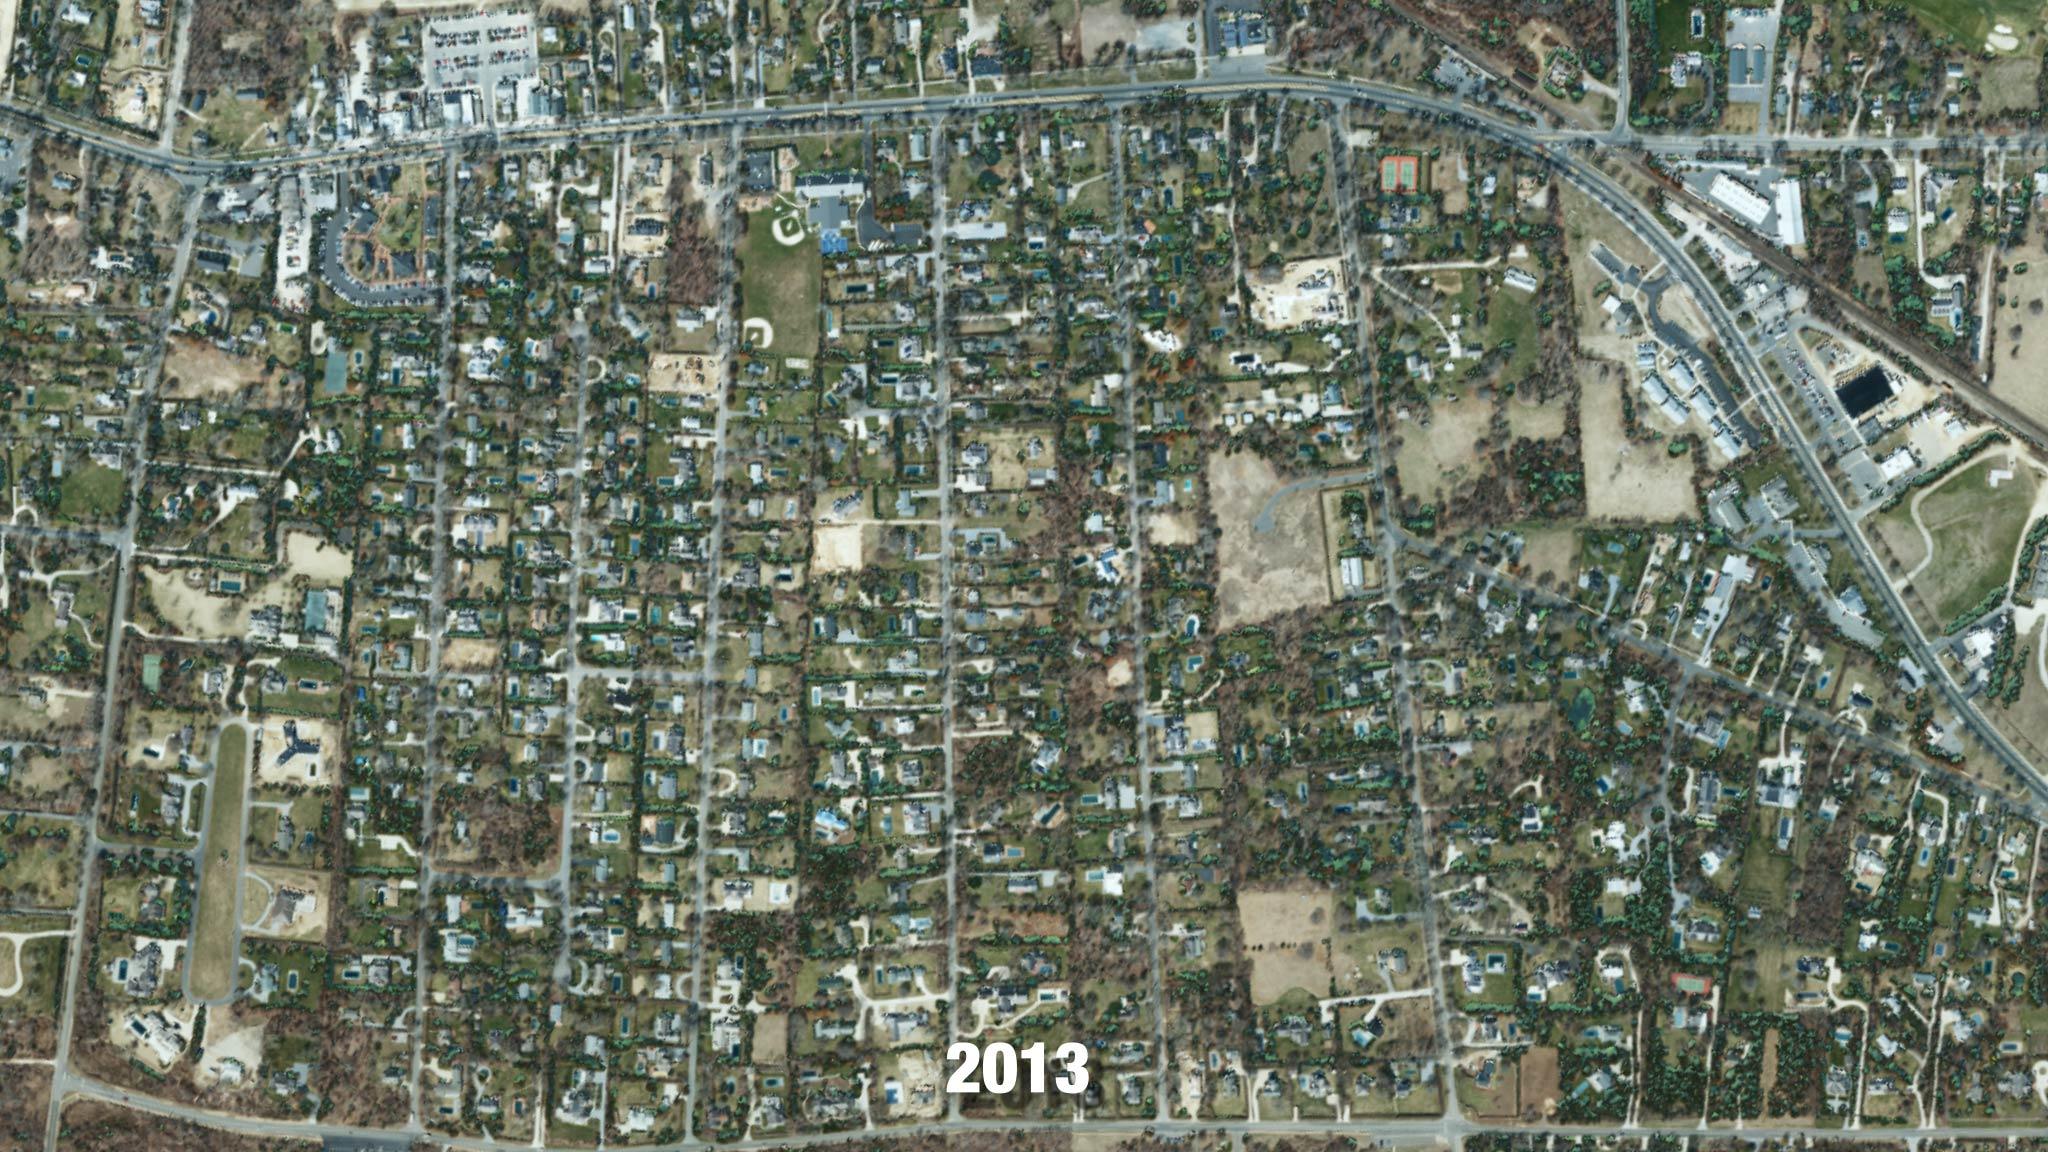 C_OBH_Hamptons_Satellite_2k_Static_03_After_Year.jpg